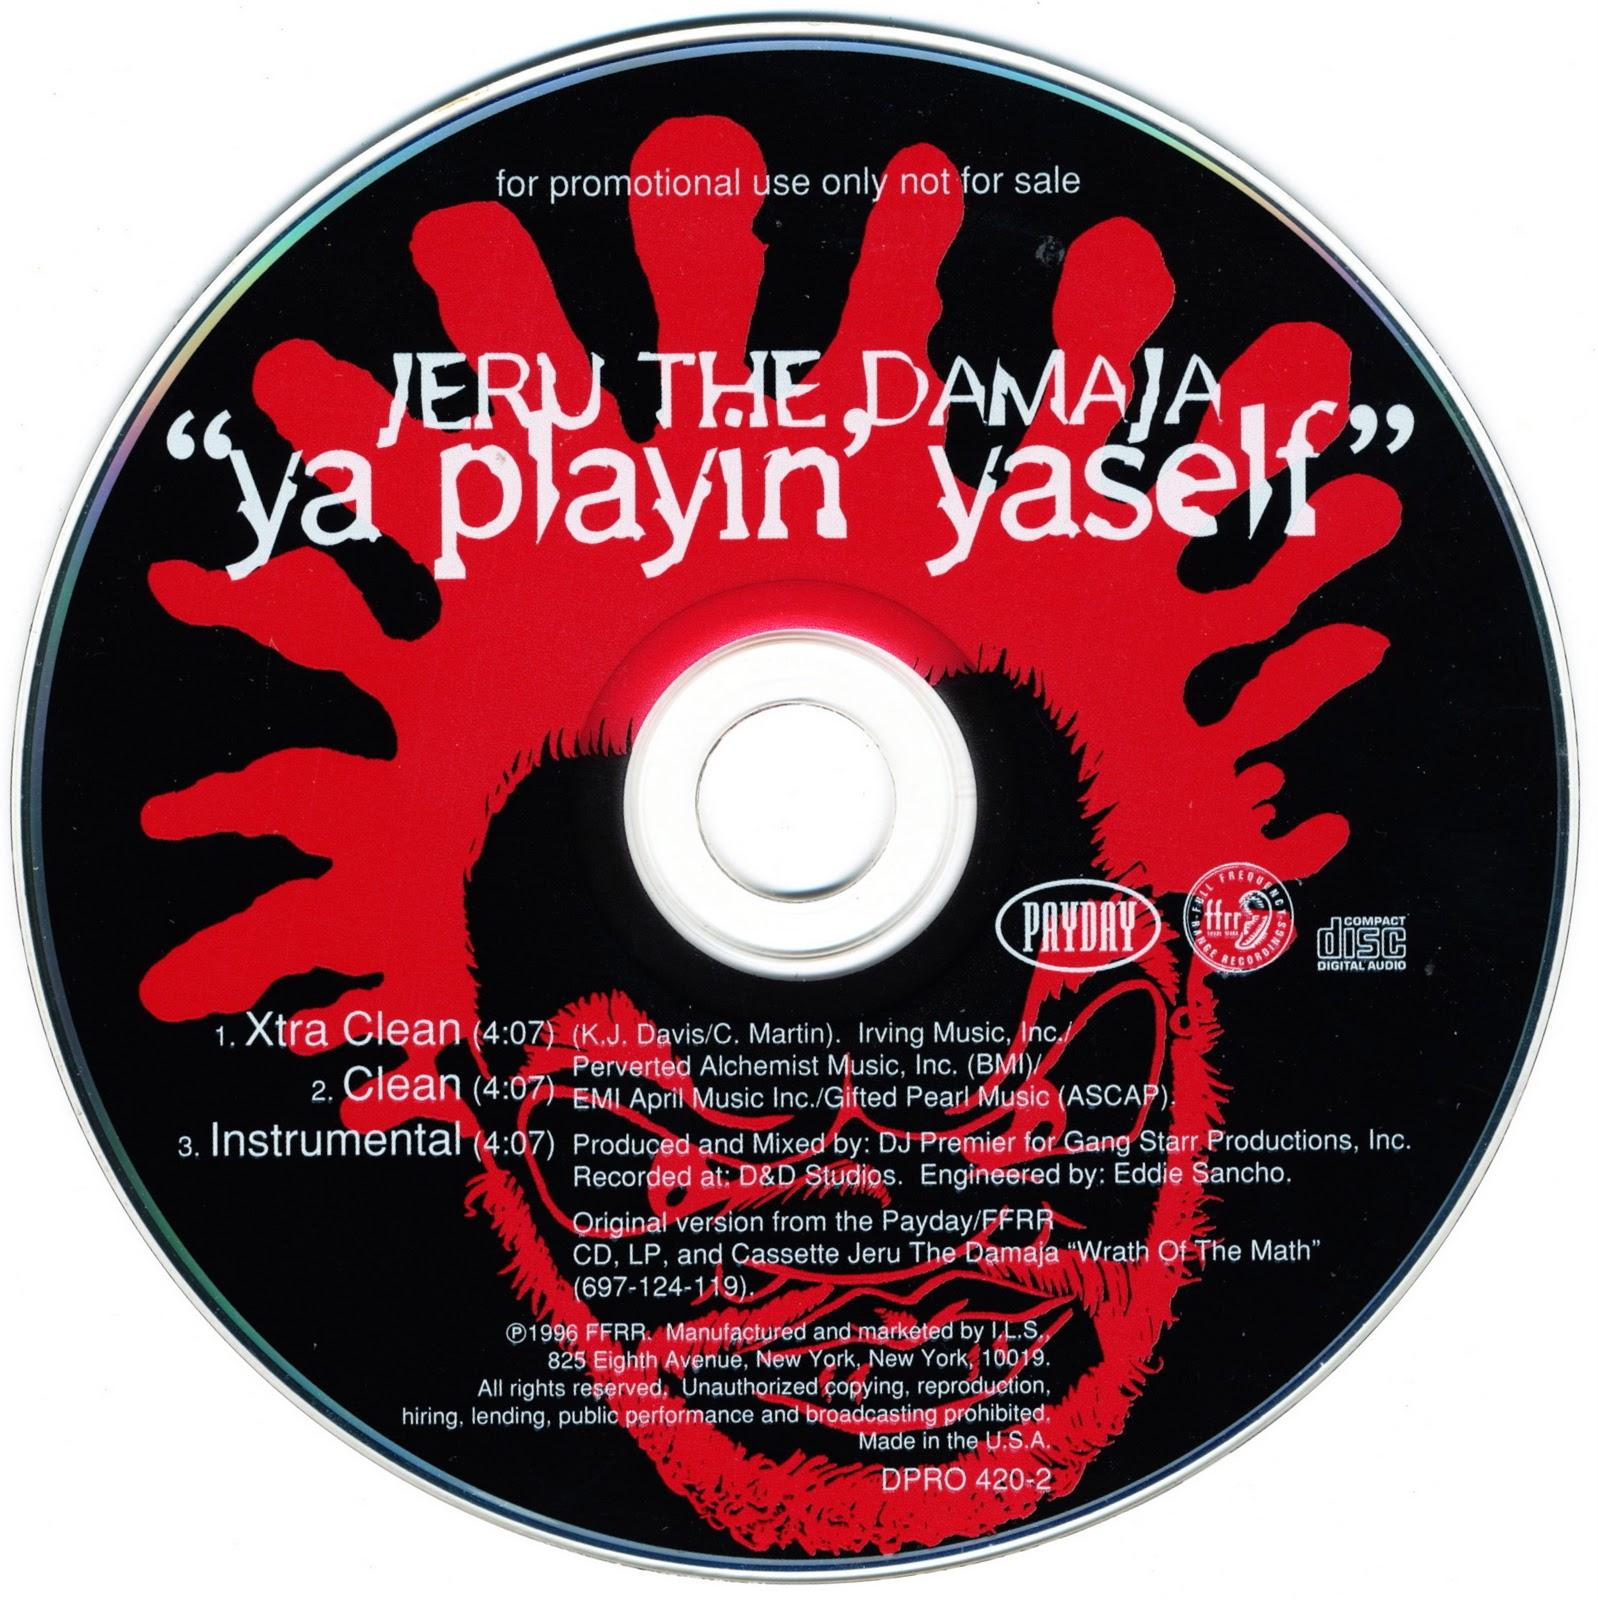 http://2.bp.blogspot.com/-i-4dVEvktac/TrmdXZnpGdI/AAAAAAAAC2I/9qRTNDmiSVQ/s1600/Jeru+Play+CD.jpg